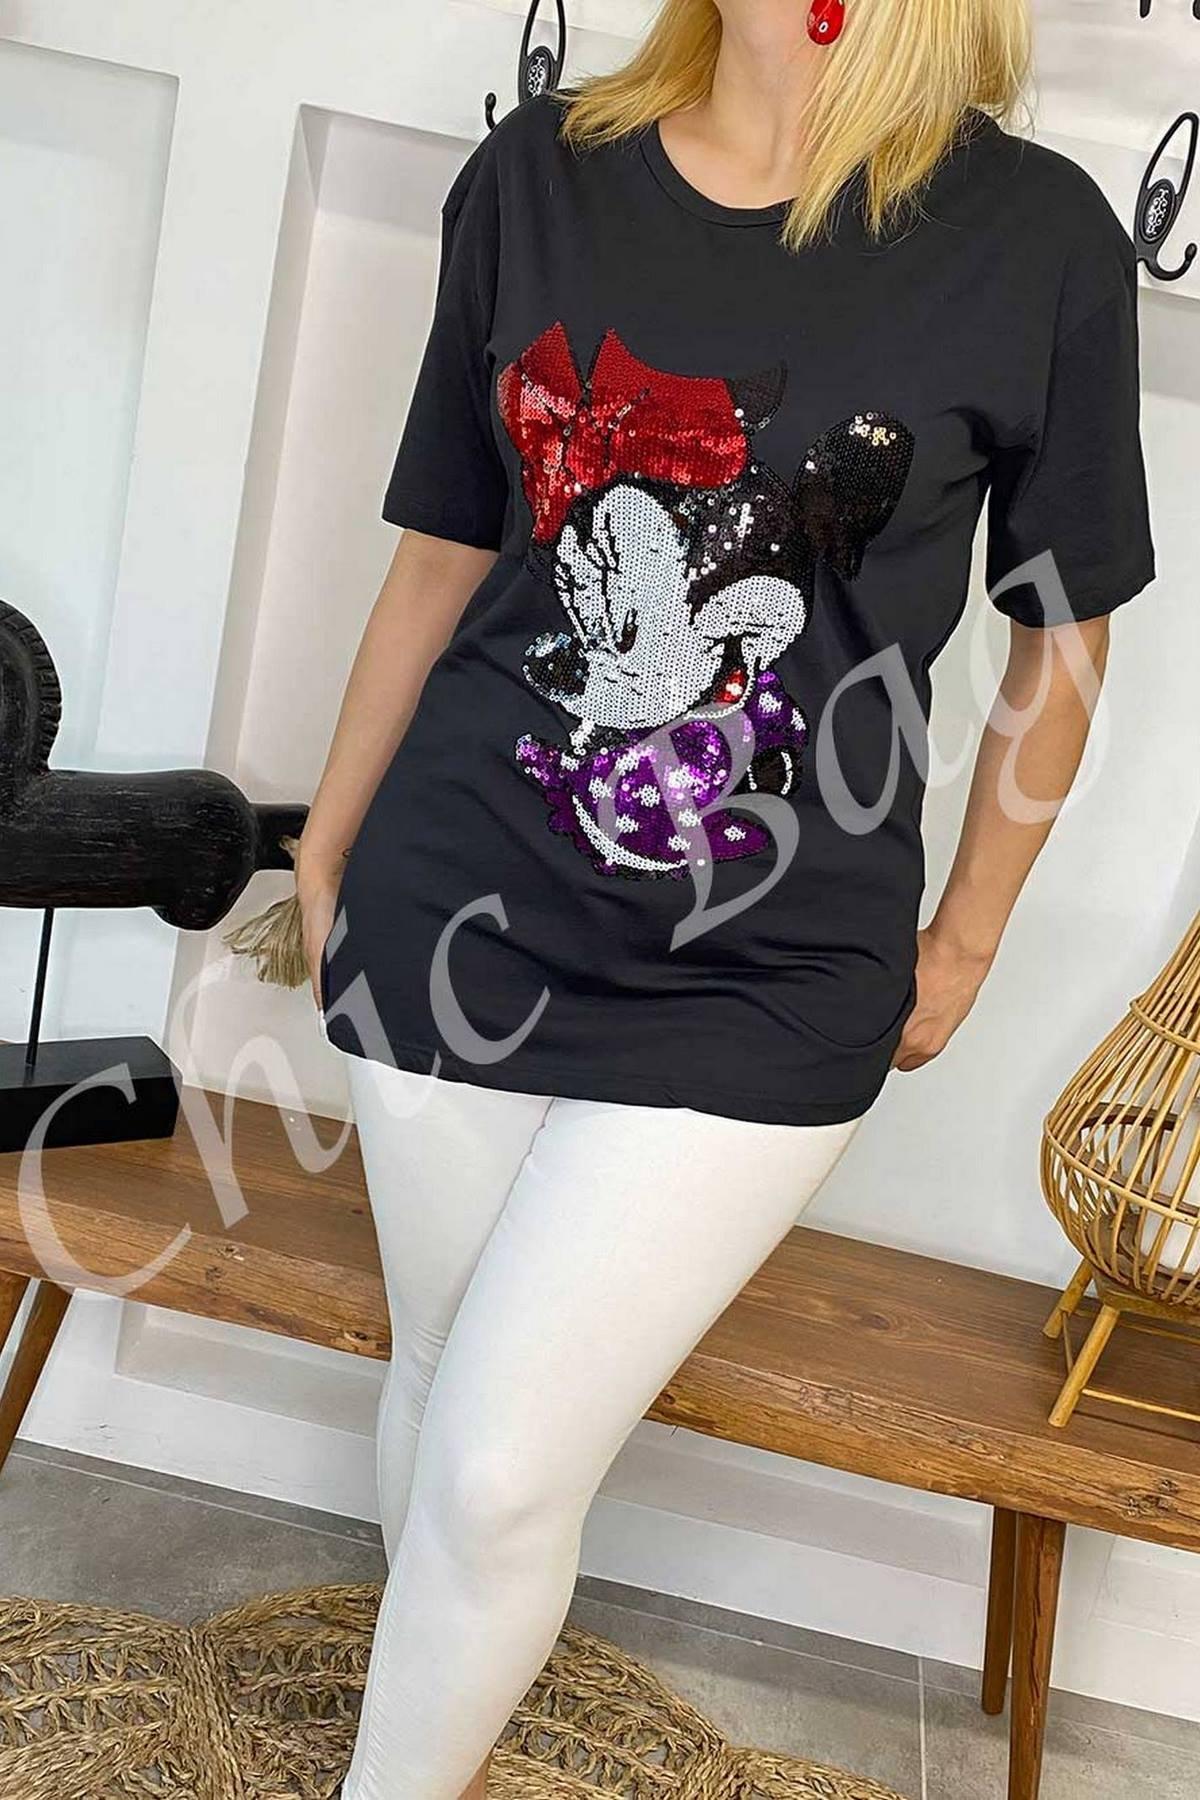 https://resim.chicbag.com.tr/chb03300101/syh/enjoy-mickey-mause-baskli-t-shirt-chb-000251-01ab104f8a8c.